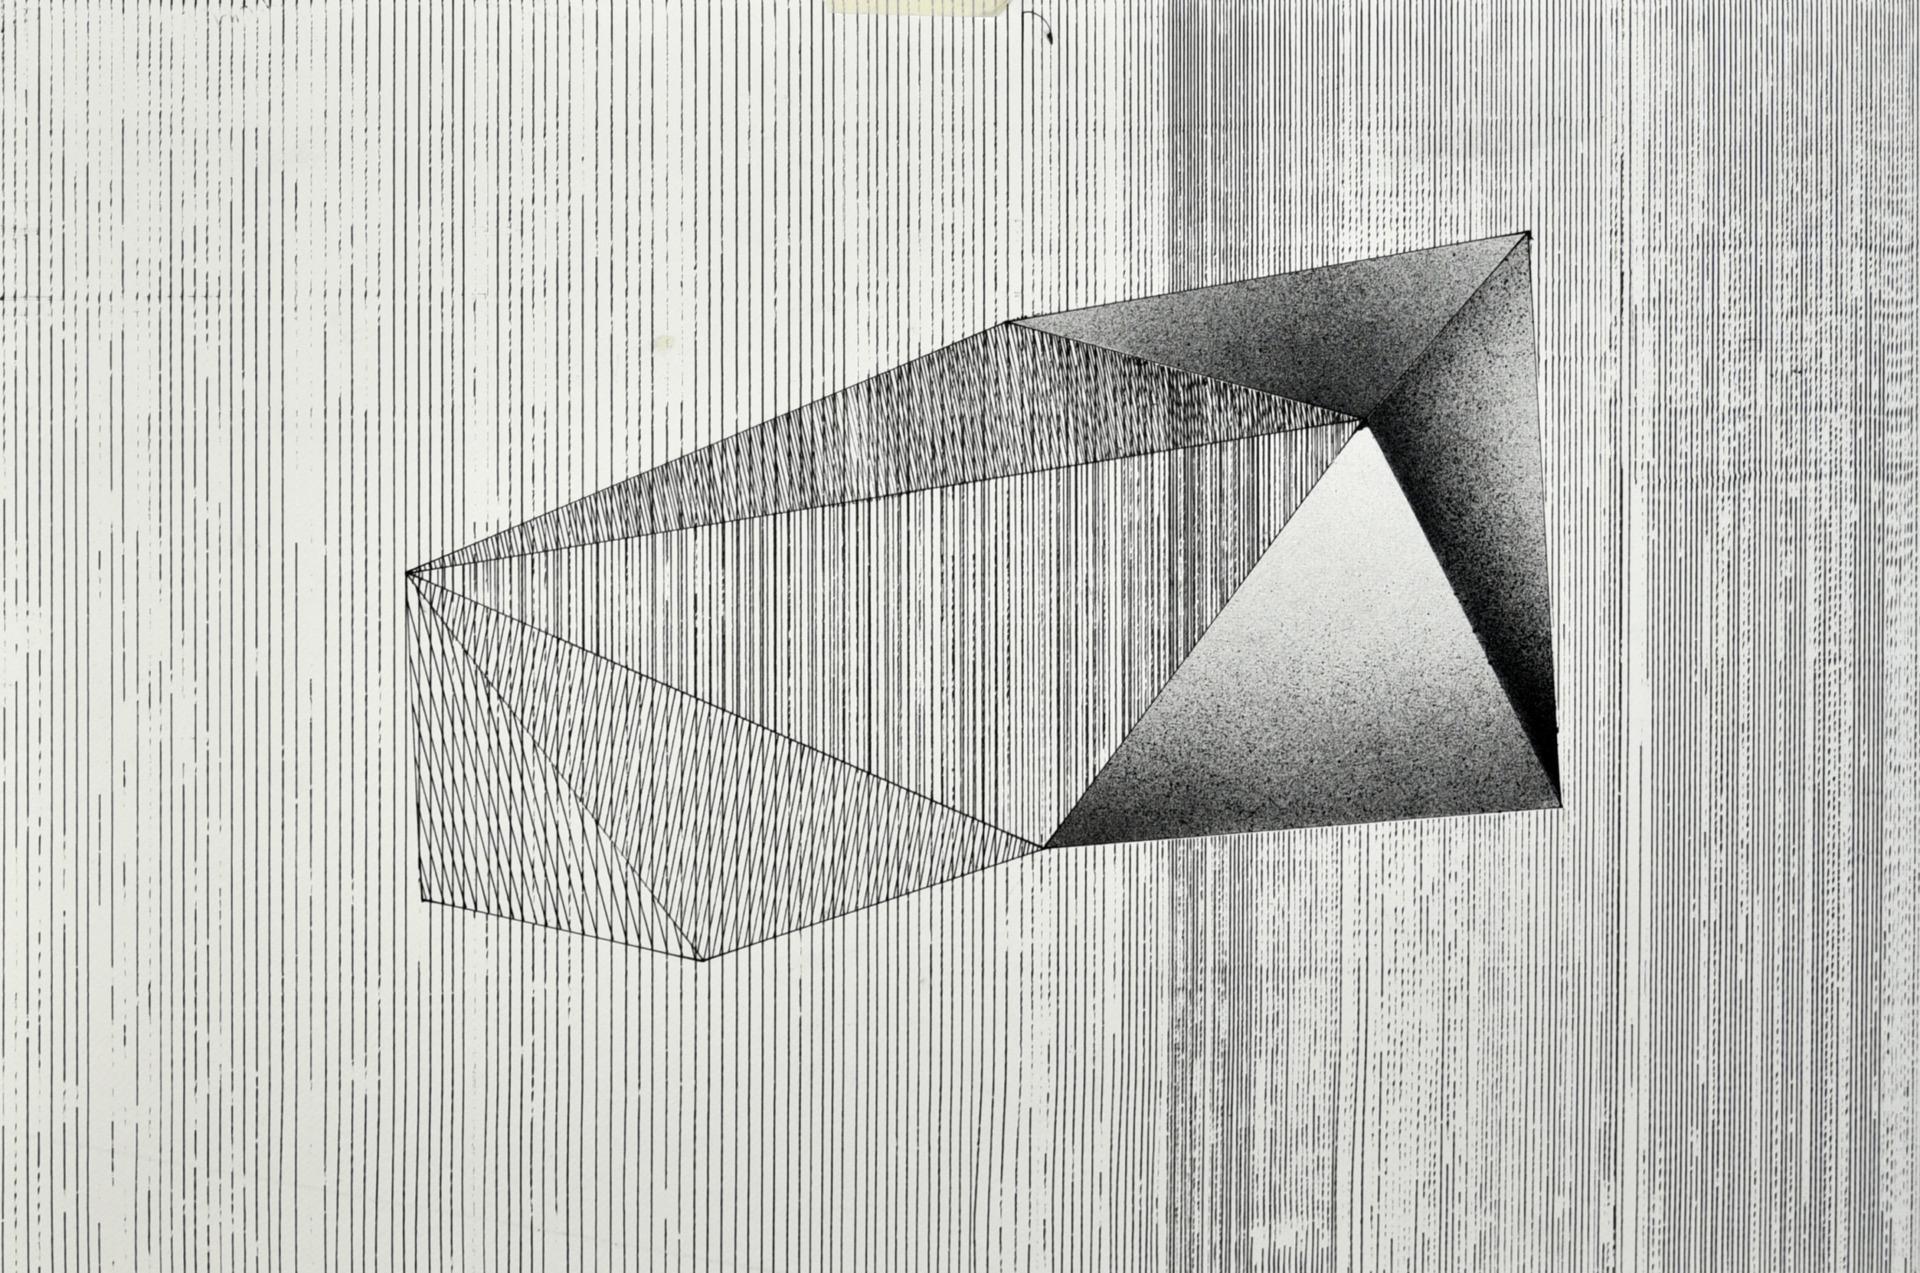 Contemporary art from Gyula Sági | Op.191220. 10